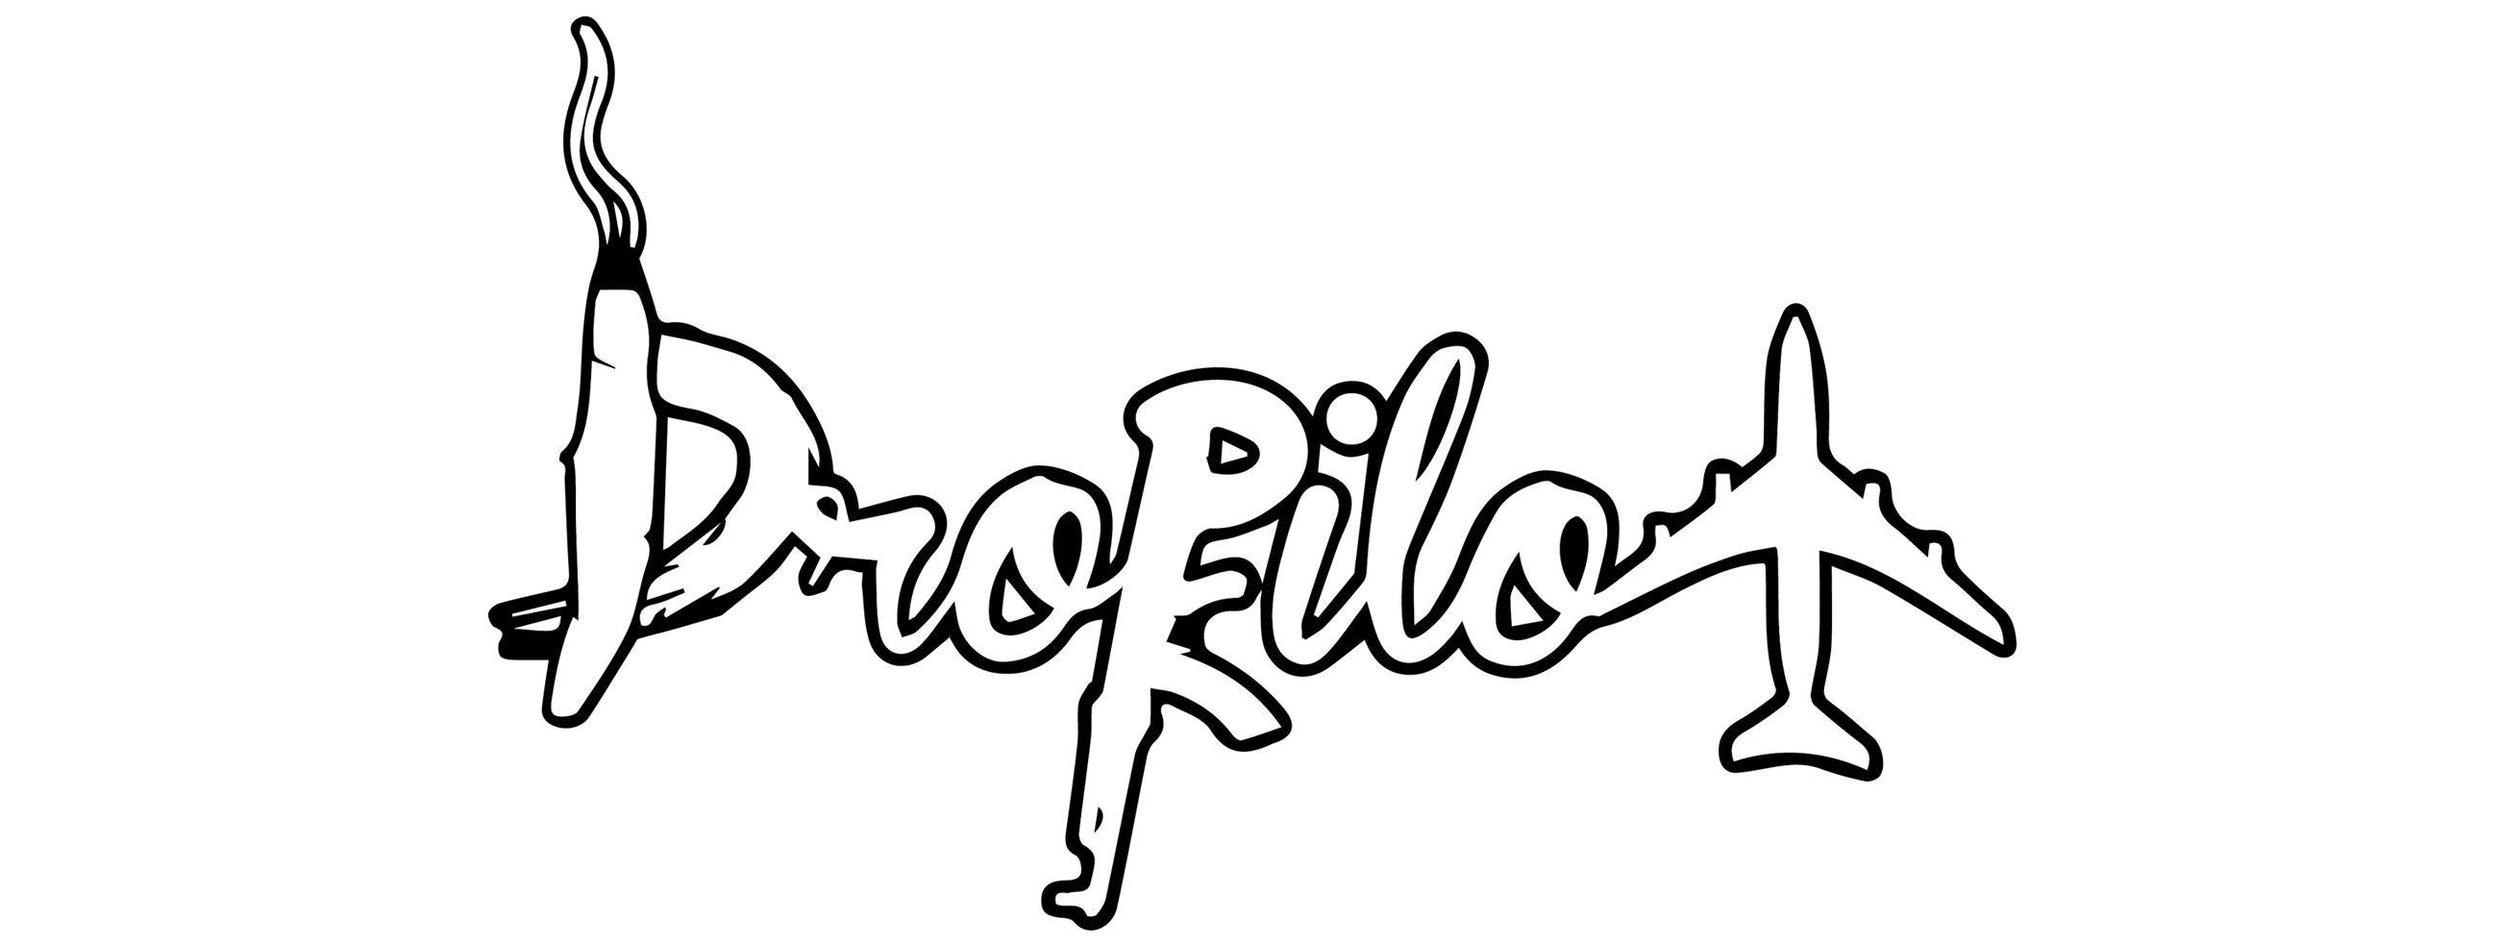 dropilot logo.jpg